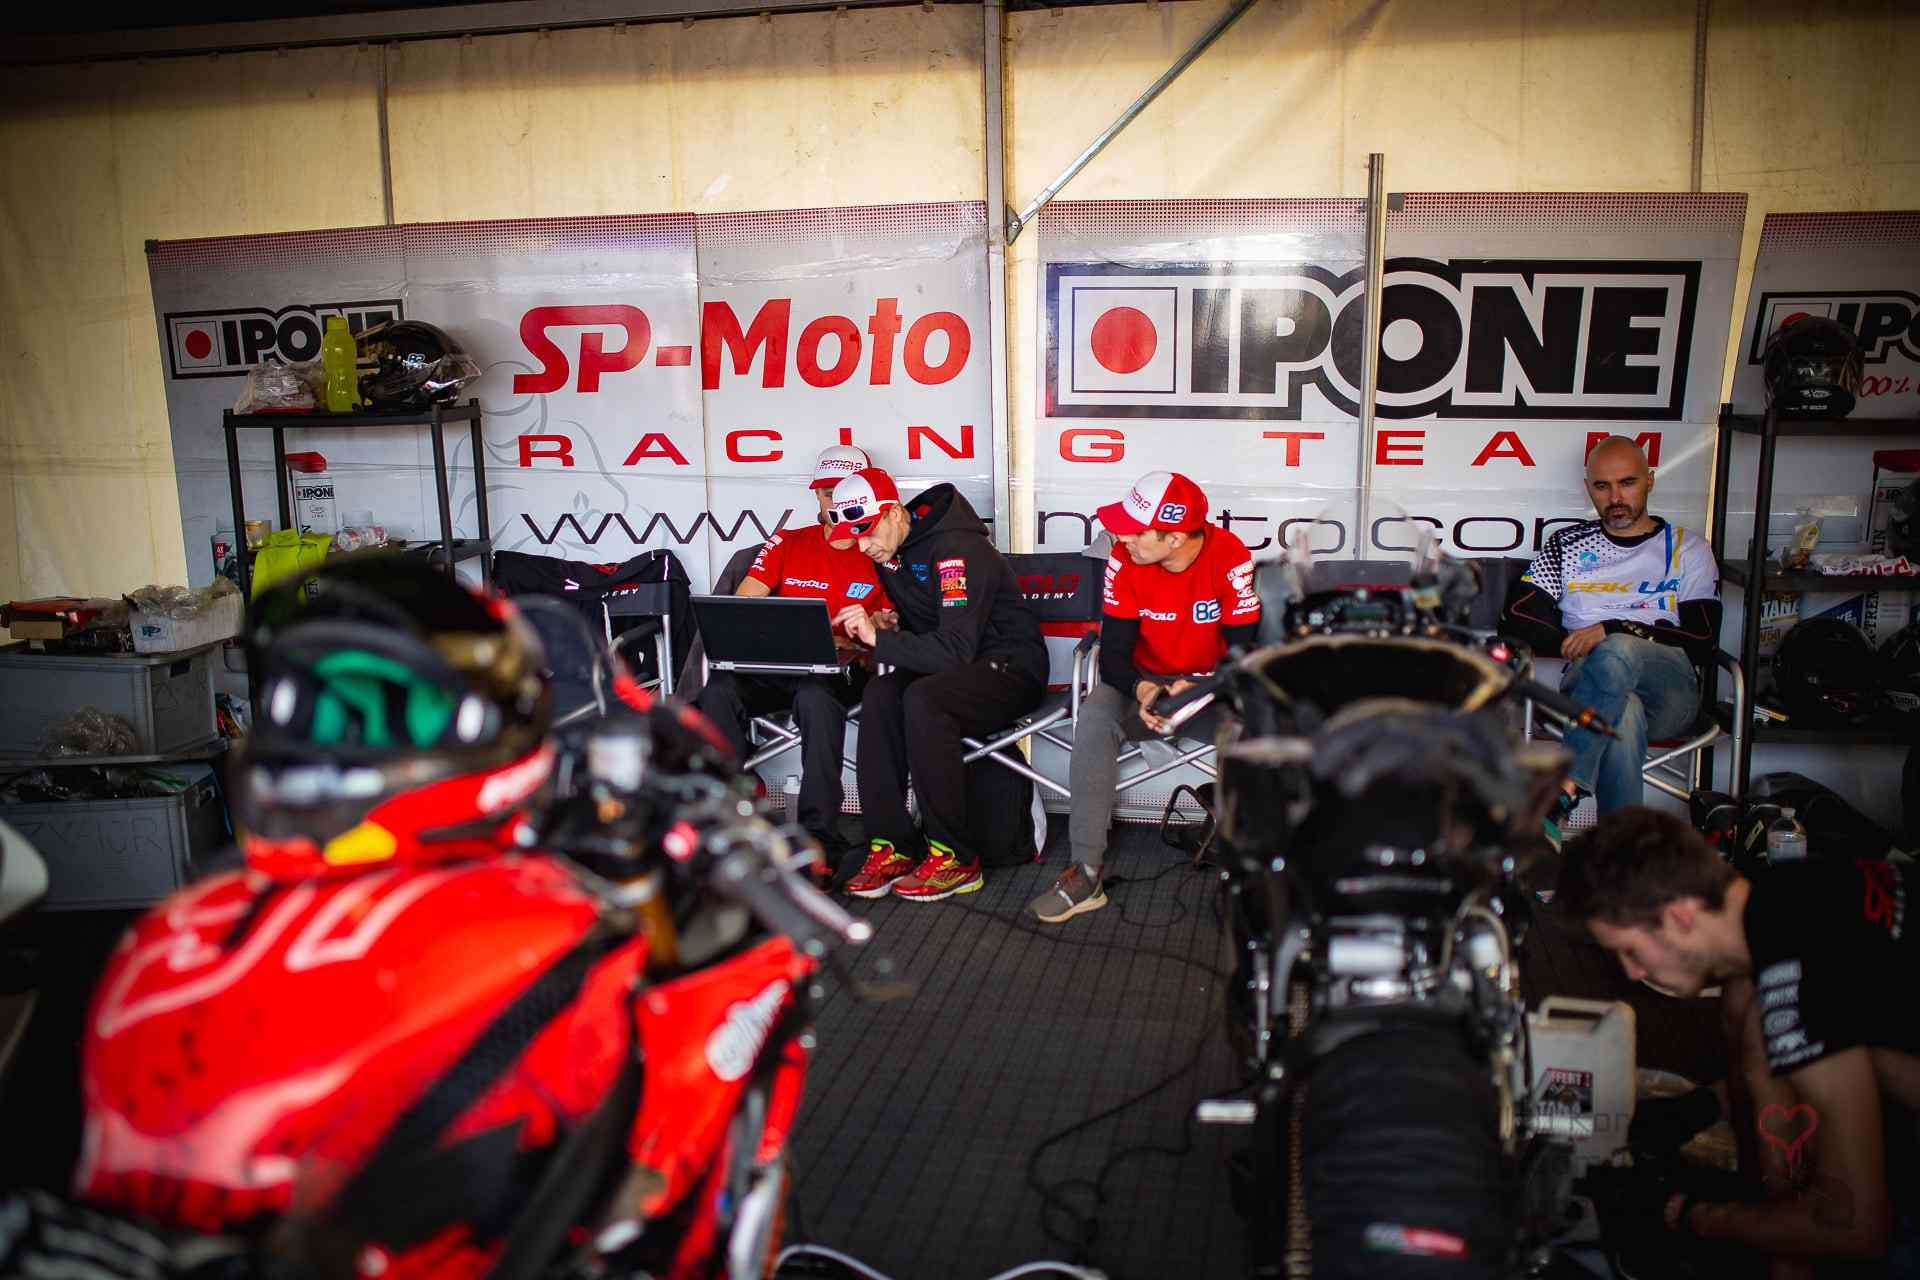 5-6_etap_MotoGPUkraine_106